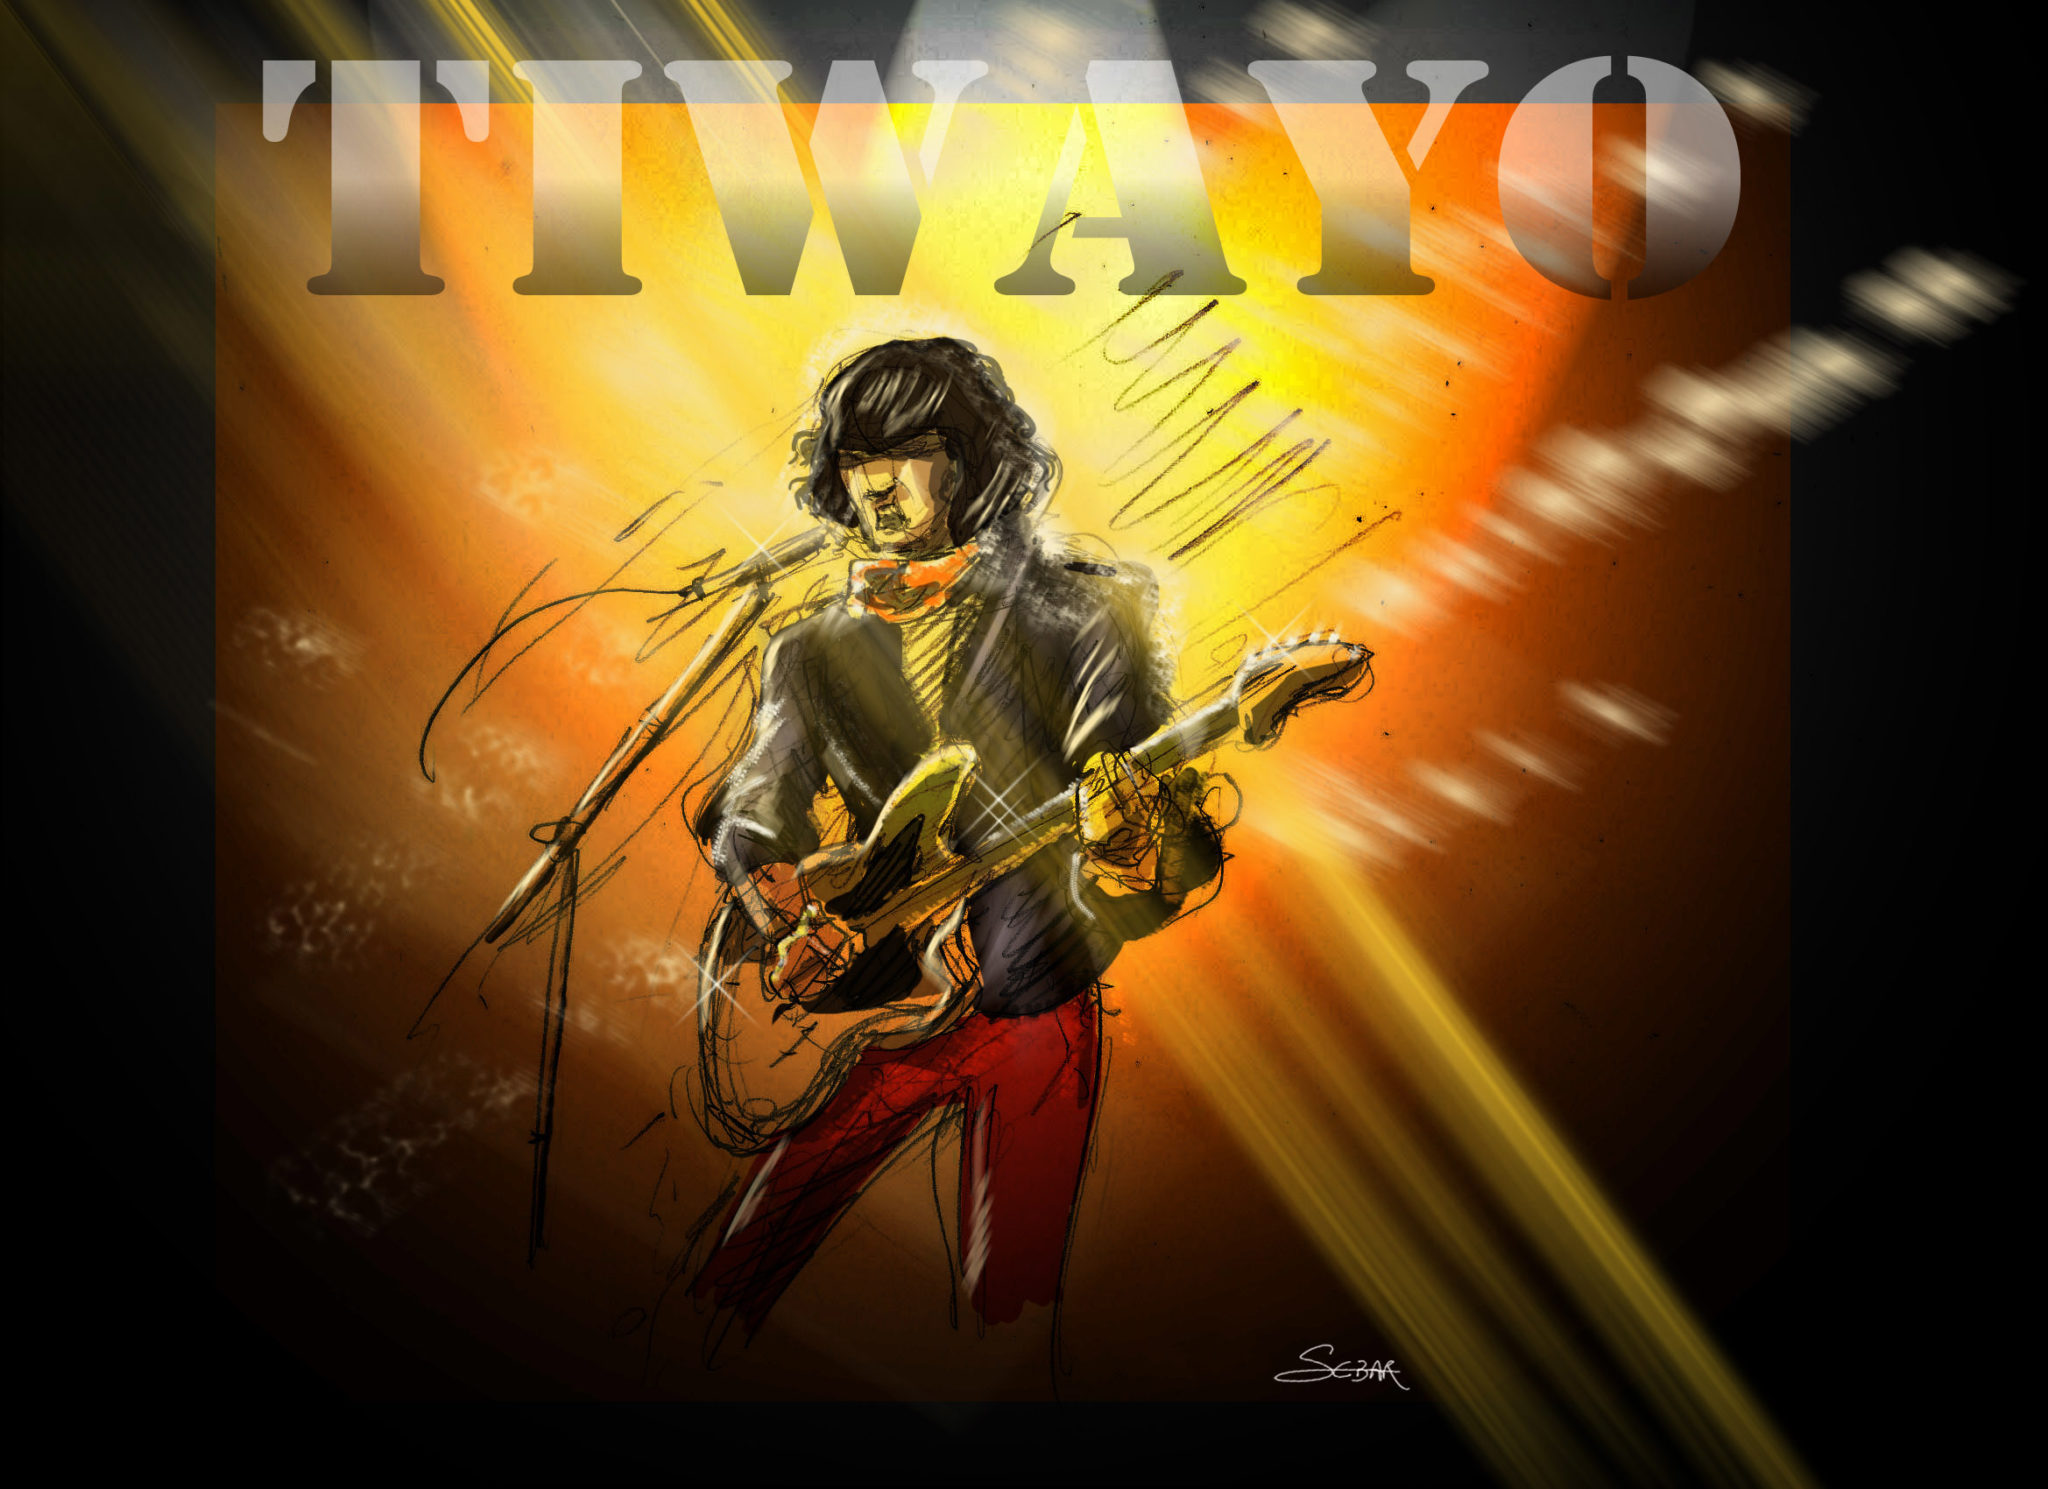 Tiwayo TITRE 3copie